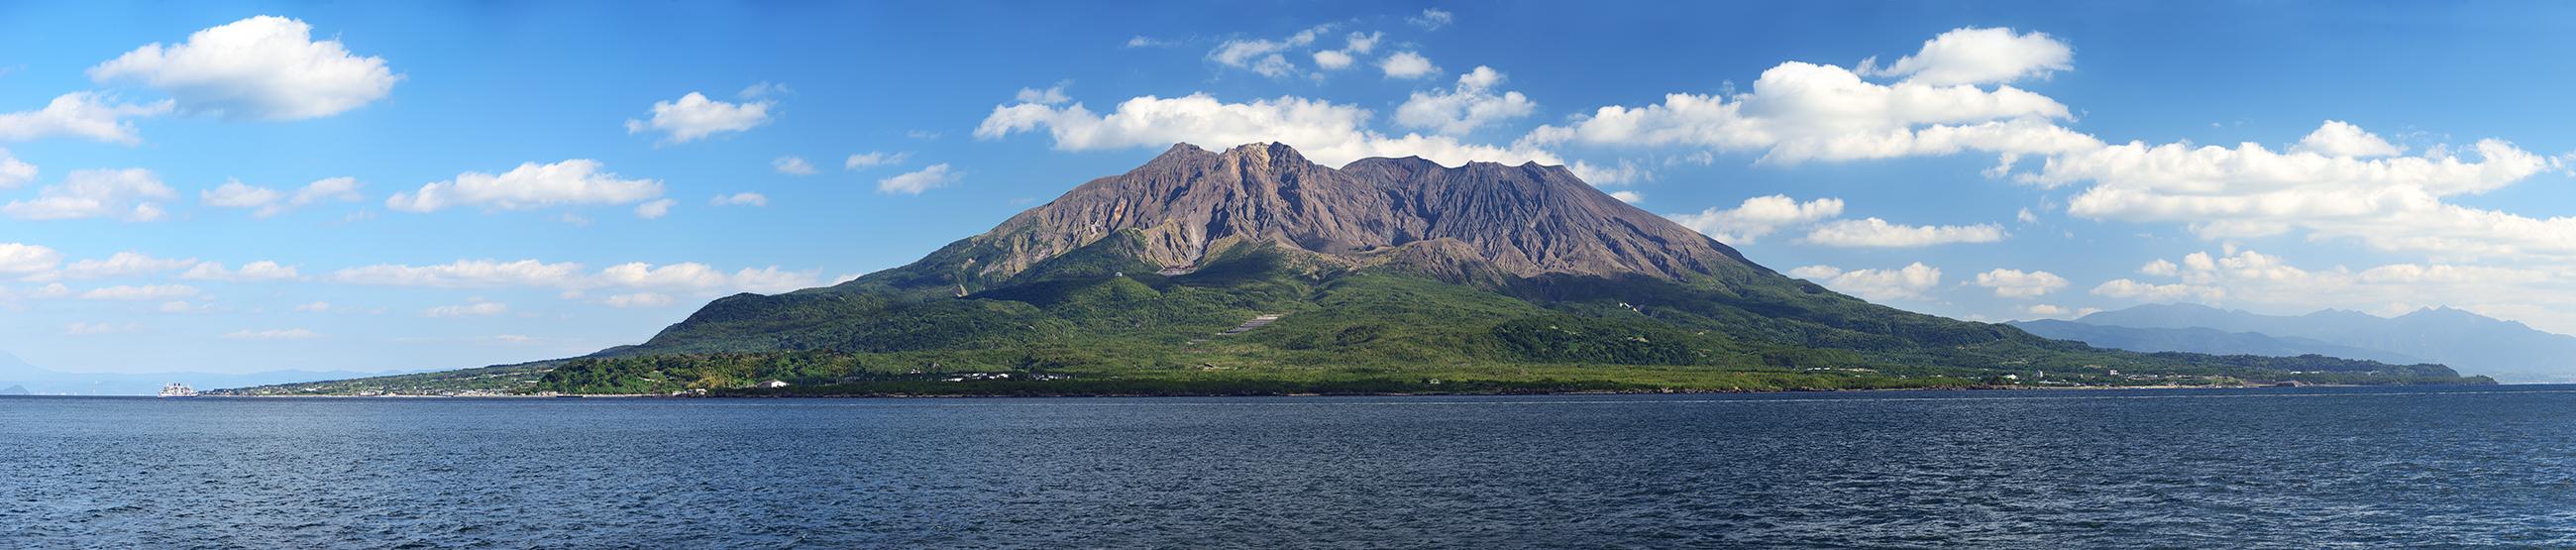 Sakurajima, Japan